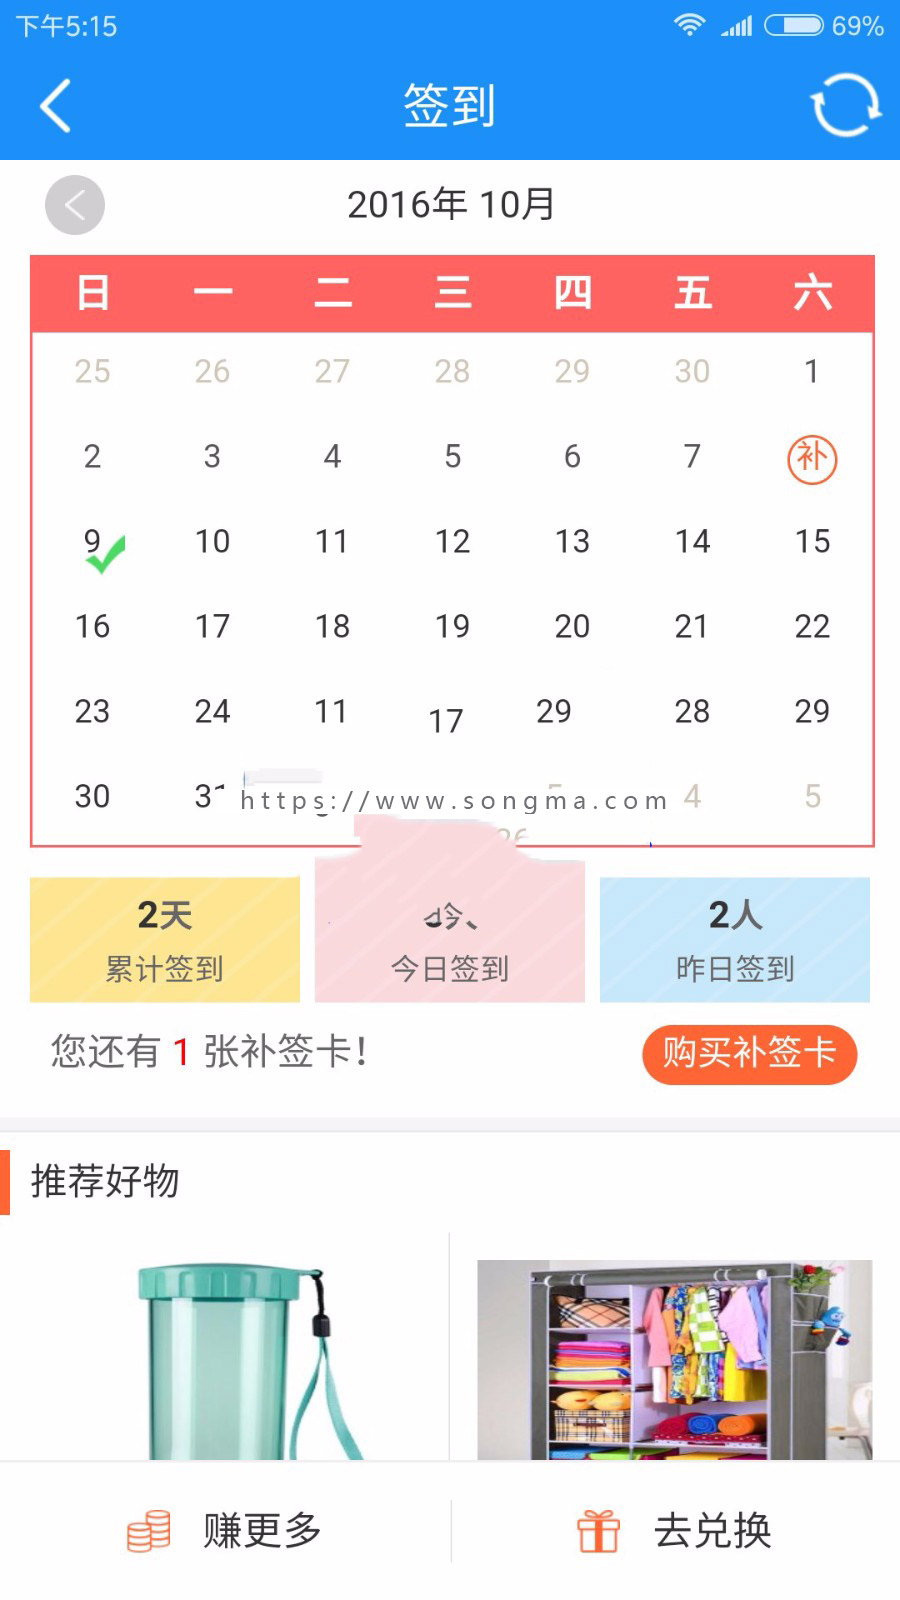 [Discuz插件] 【七豆】金币钱包 1.0 加 签到1.1.3 配合套装 共价值 759元